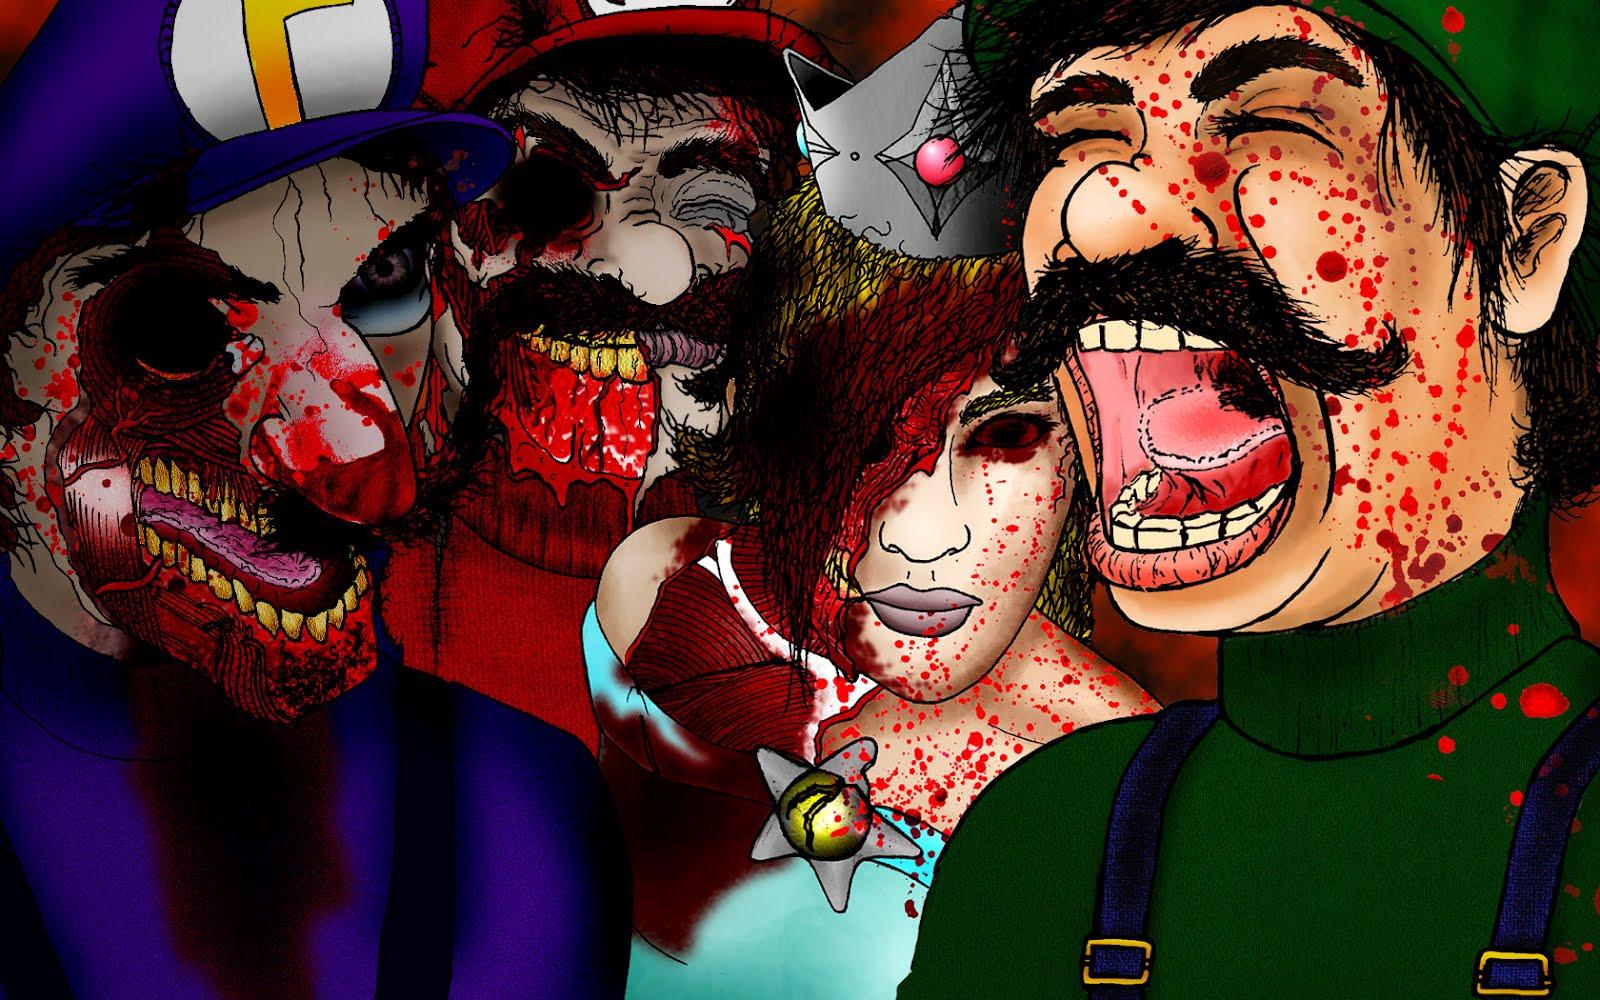 http://3.bp.blogspot.com/-UpwGL0l7cPo/UEwgrMxEbTI/AAAAAAAAAHE/0rT8VGpa2to/s1600/Super-Mario-Halloween-Wallpaper-779081.jpg